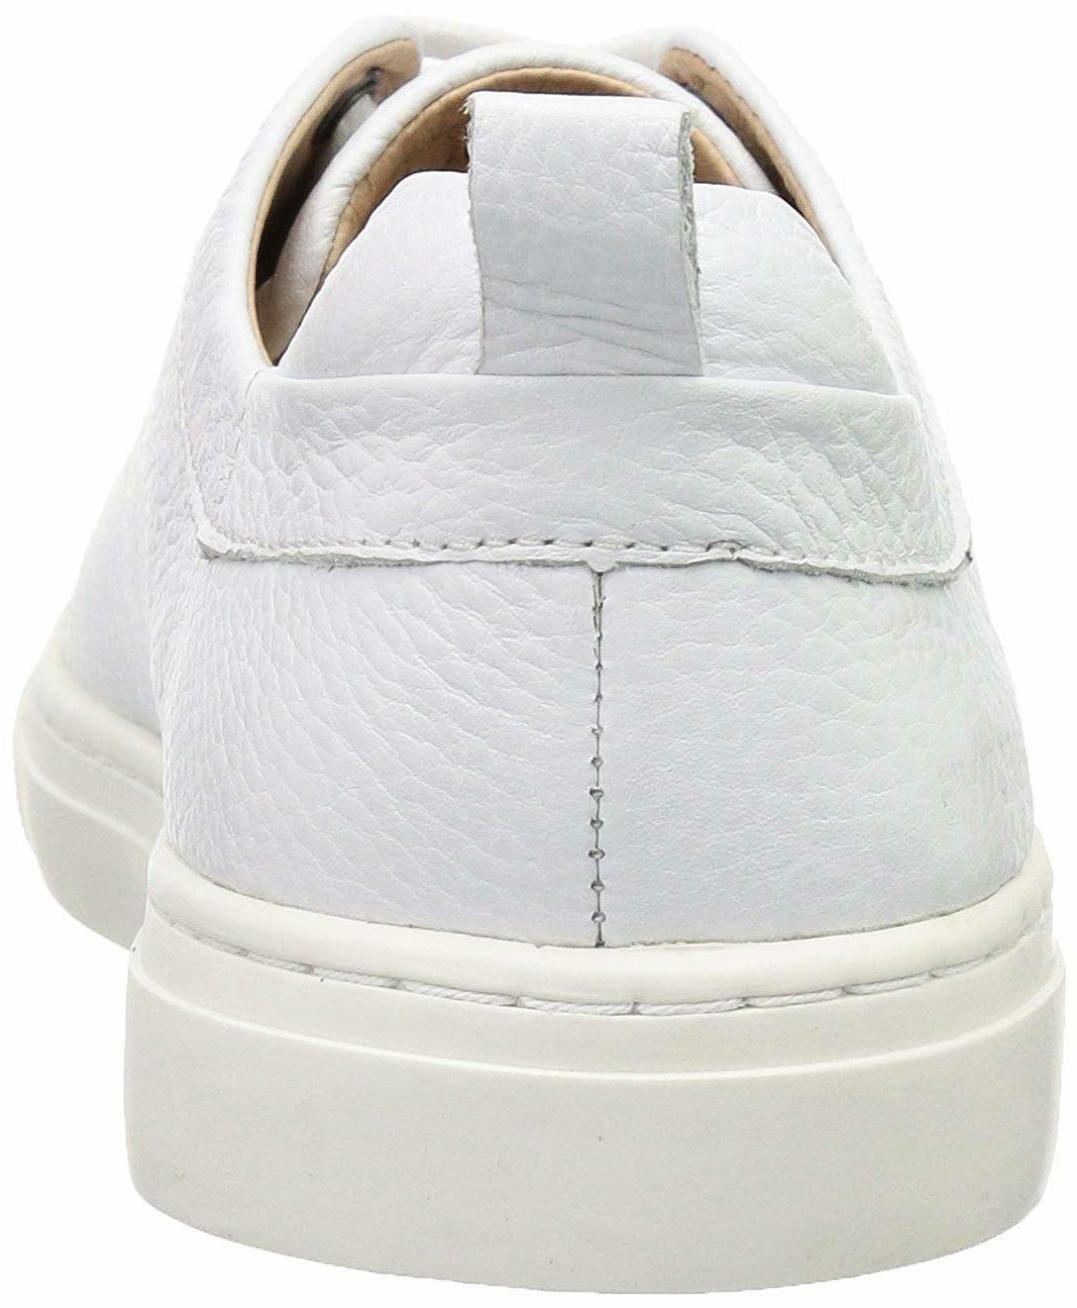 206 Lemolo Lace-up Leather Sneakers 11B USA